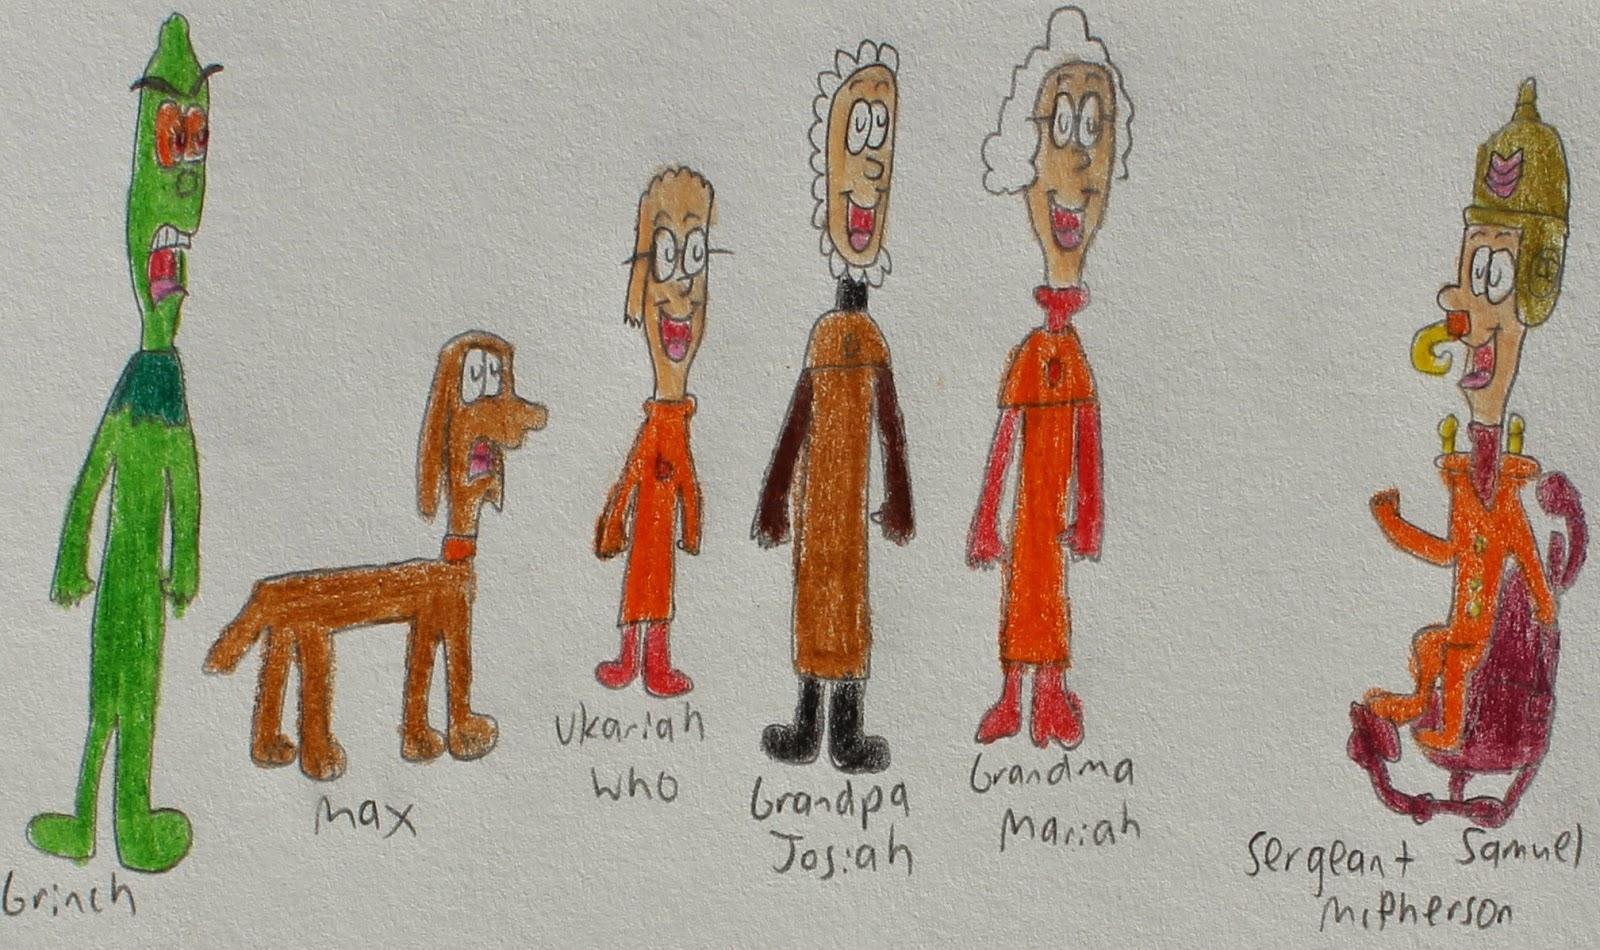 Franklin's World of Cartoons: Halloween is Grinch Night